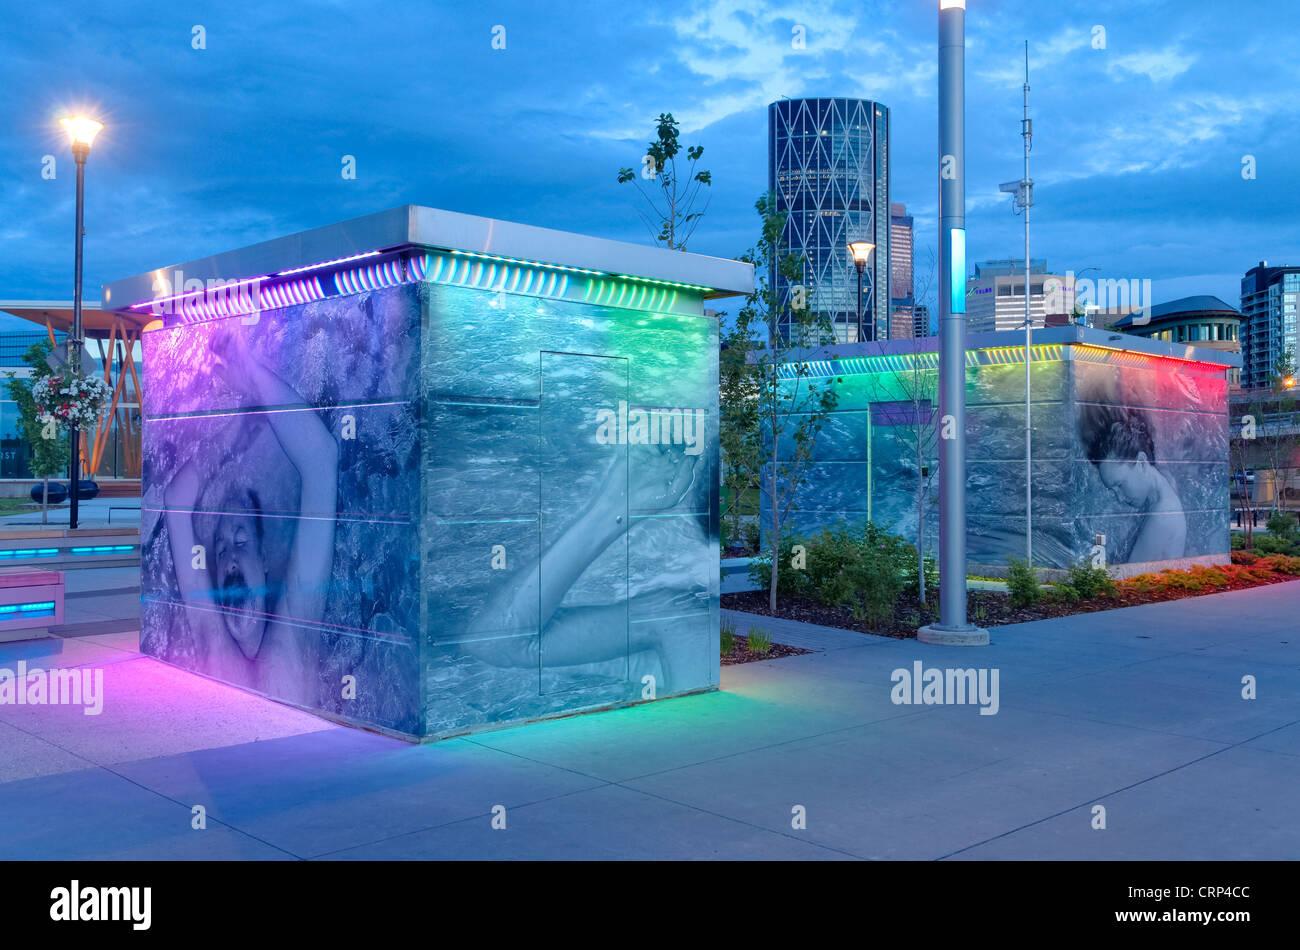 Arty, high tech les toilettes publiques, East Village, Calgary, Alberta, Canada Photo Stock